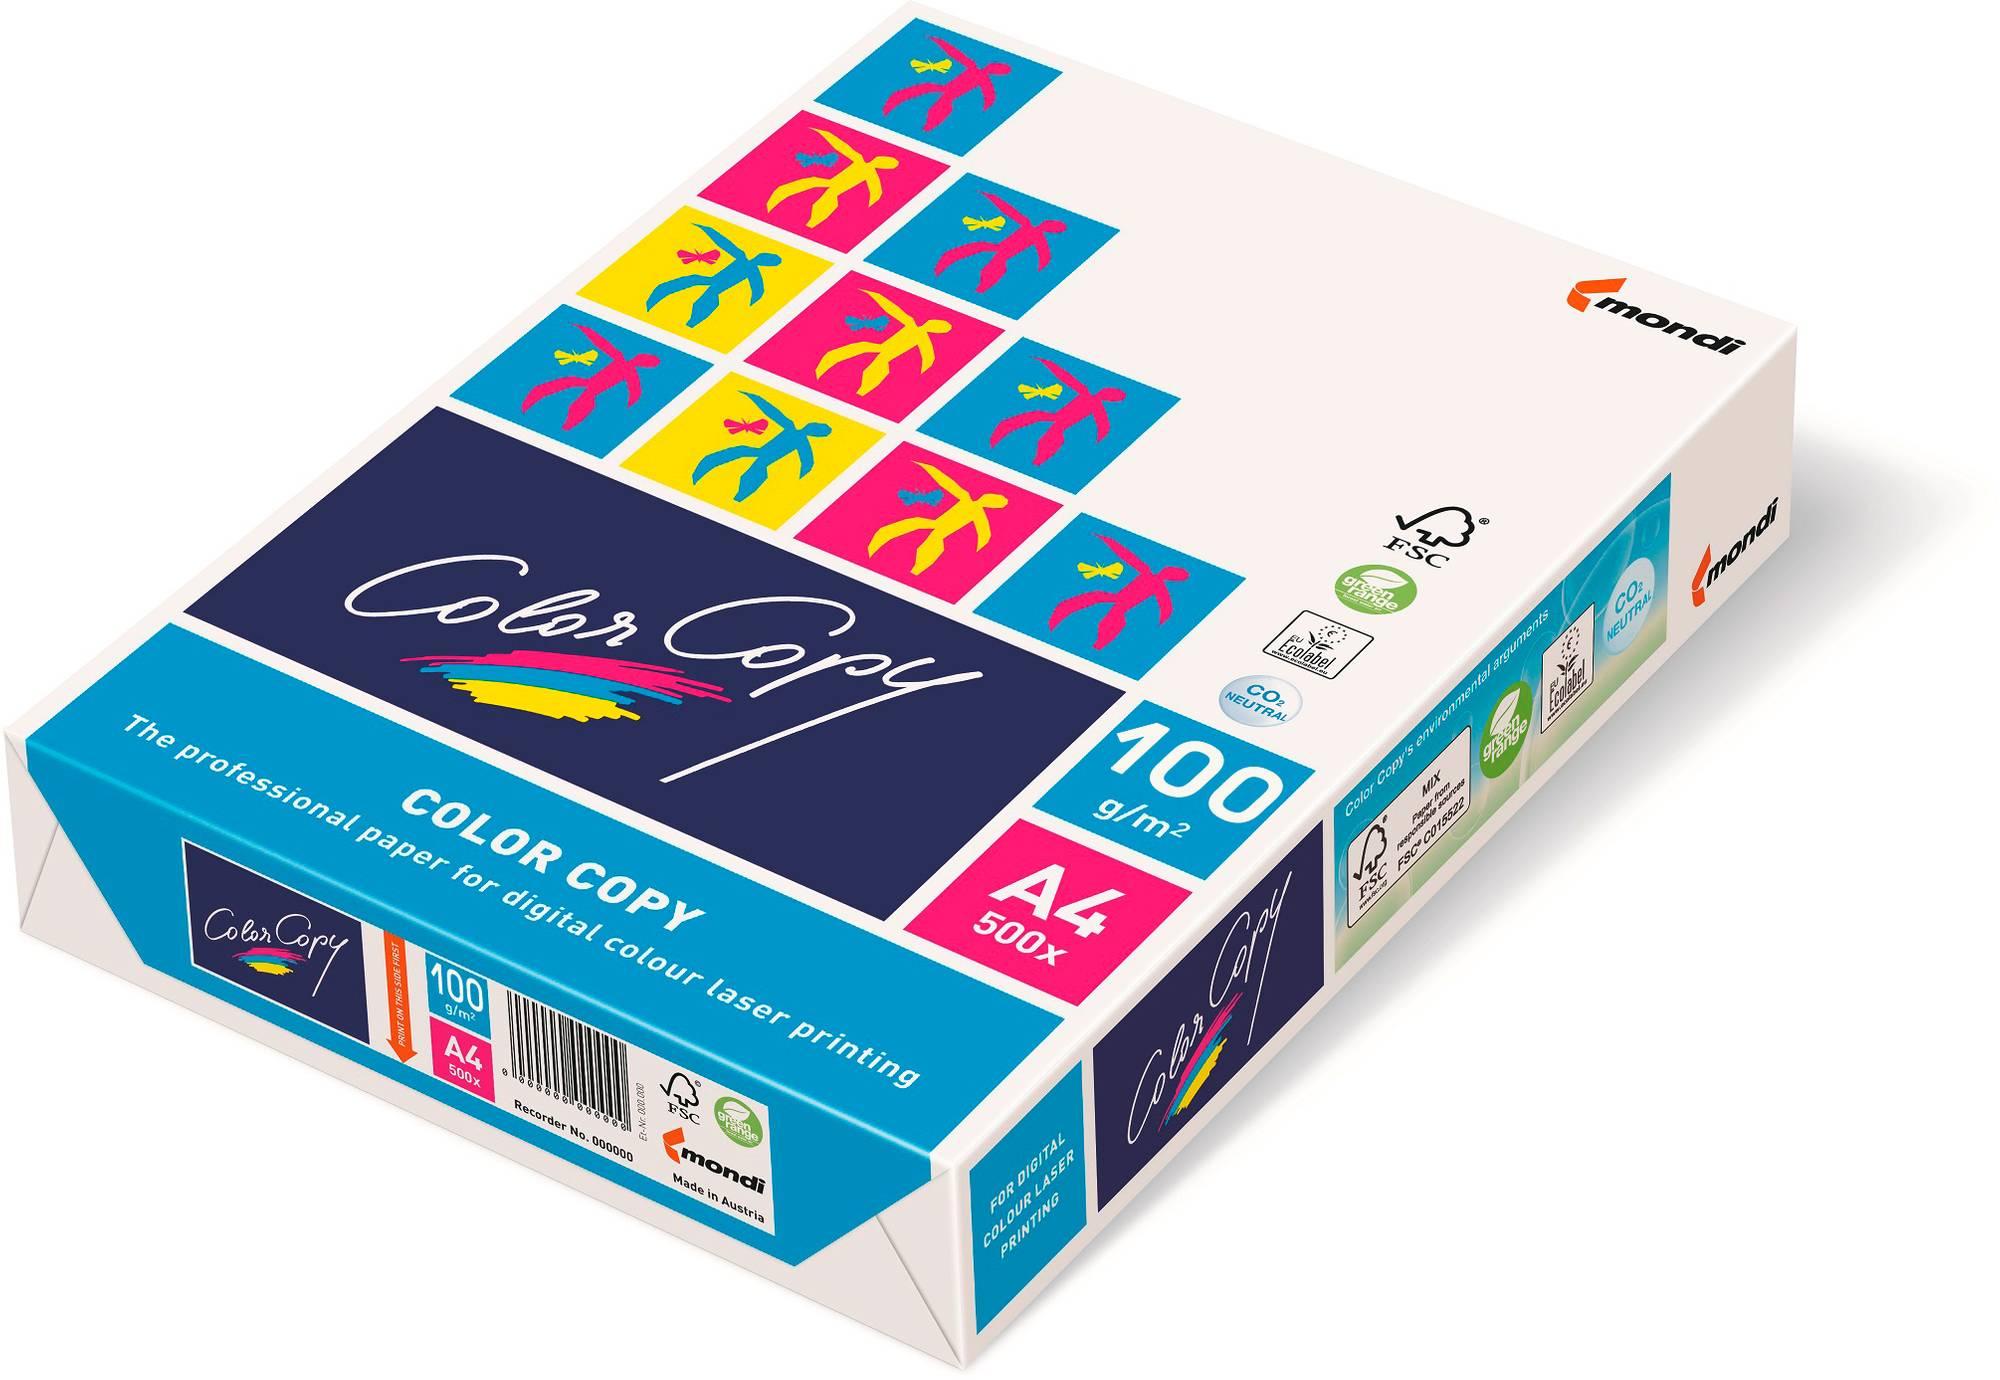 Kopier-/Druckerpapier Mondi Color-Copy weiß DIN A4, 100 g/qm 500 Blatt, beidseitig bedruckbar